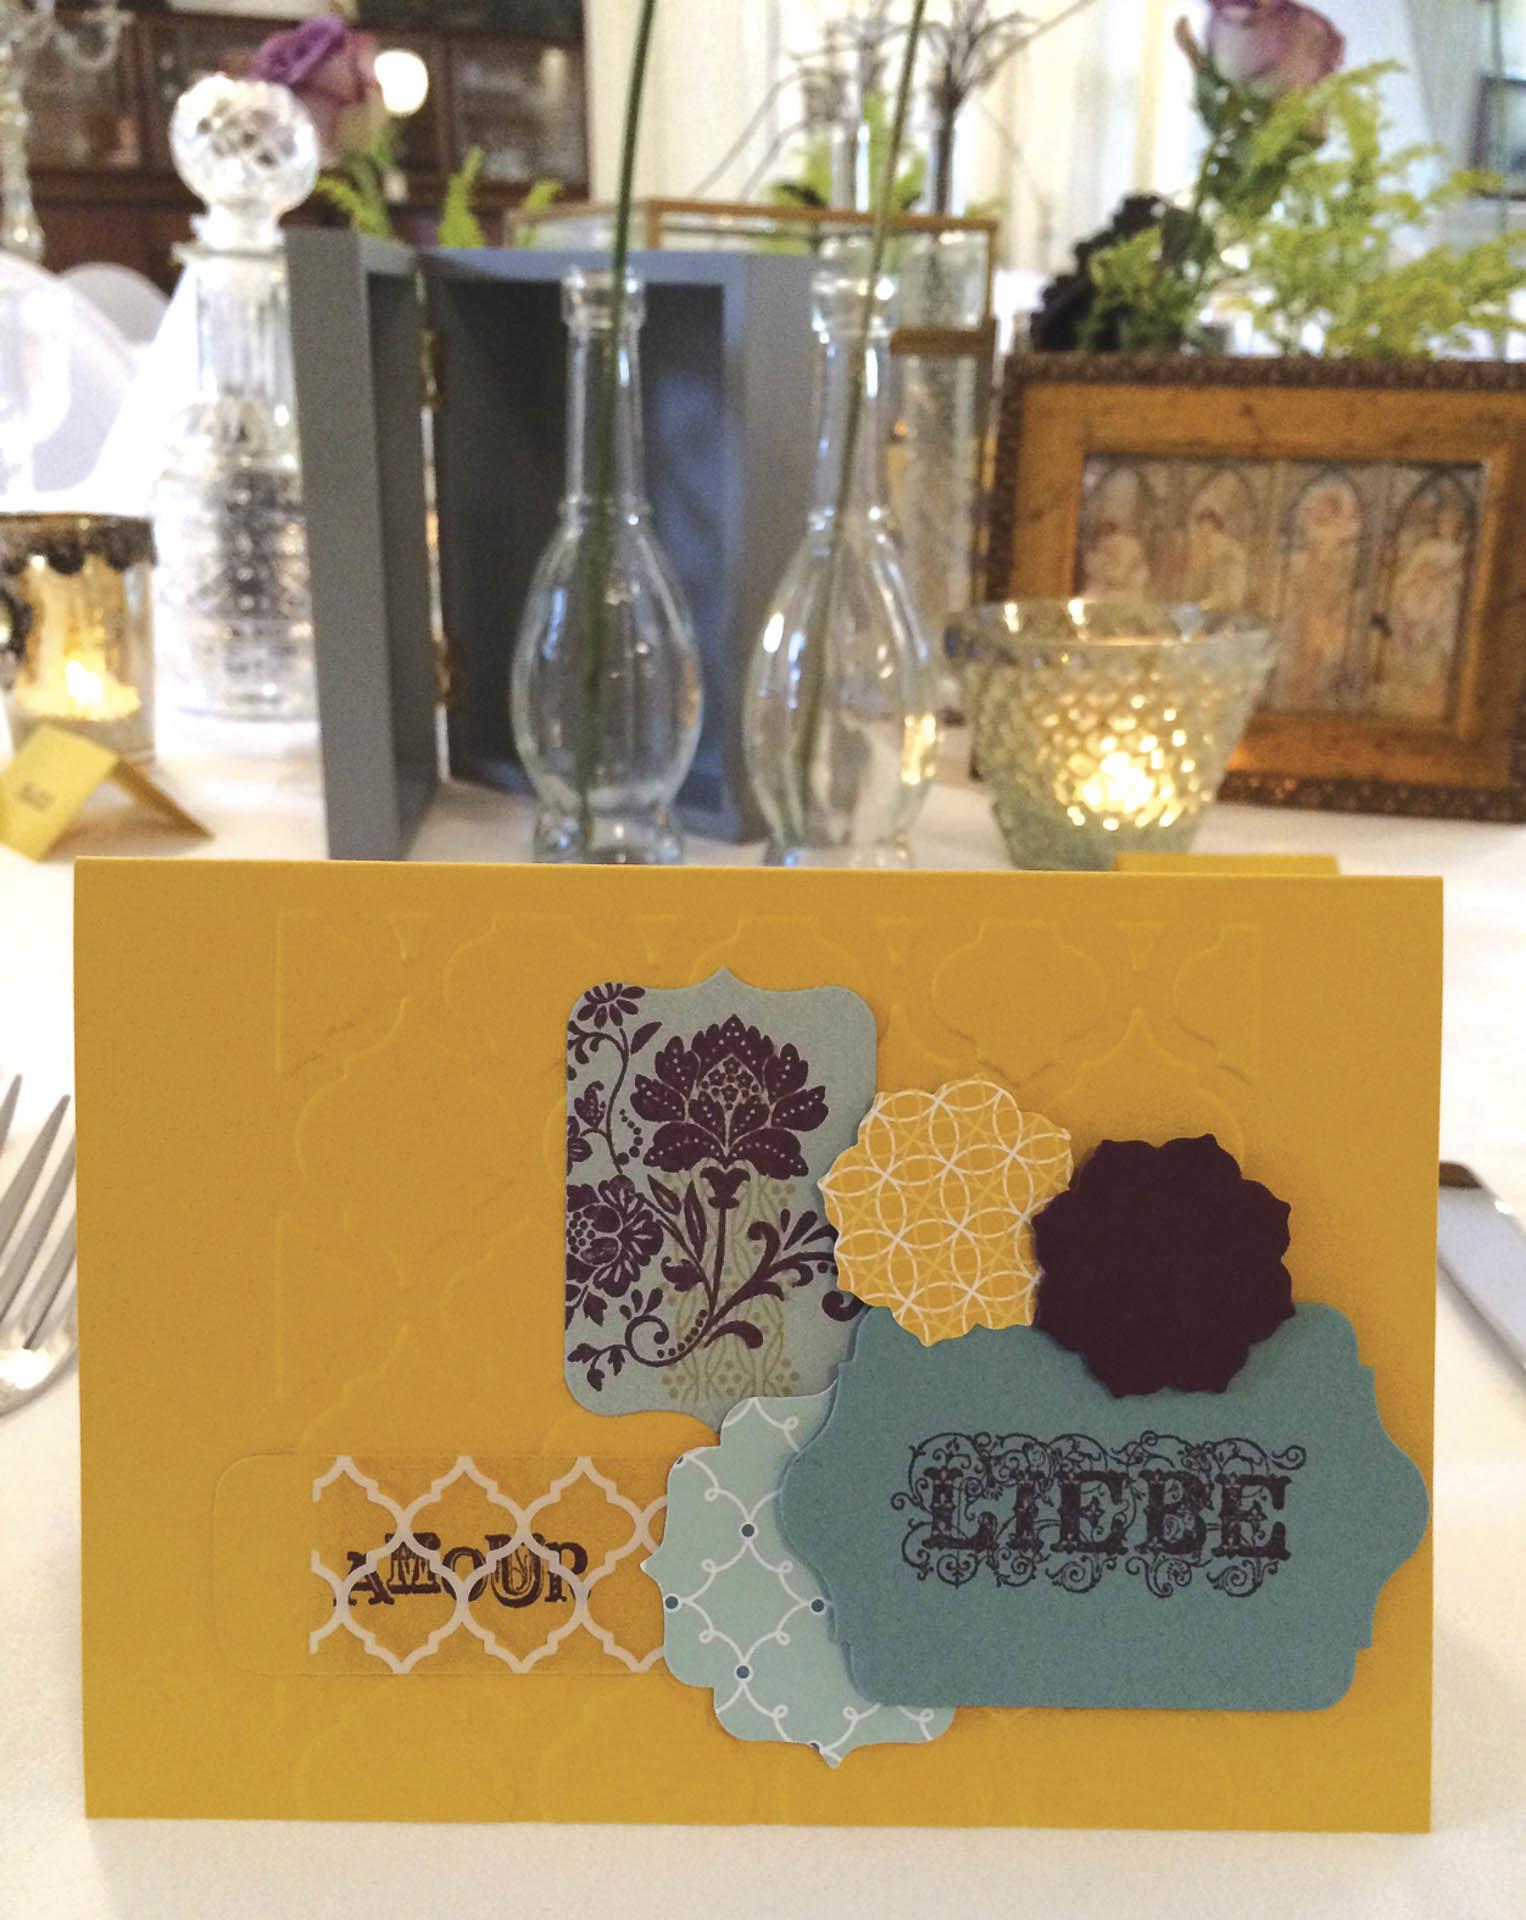 art noveau 4 the wedding table. Black Bedroom Furniture Sets. Home Design Ideas